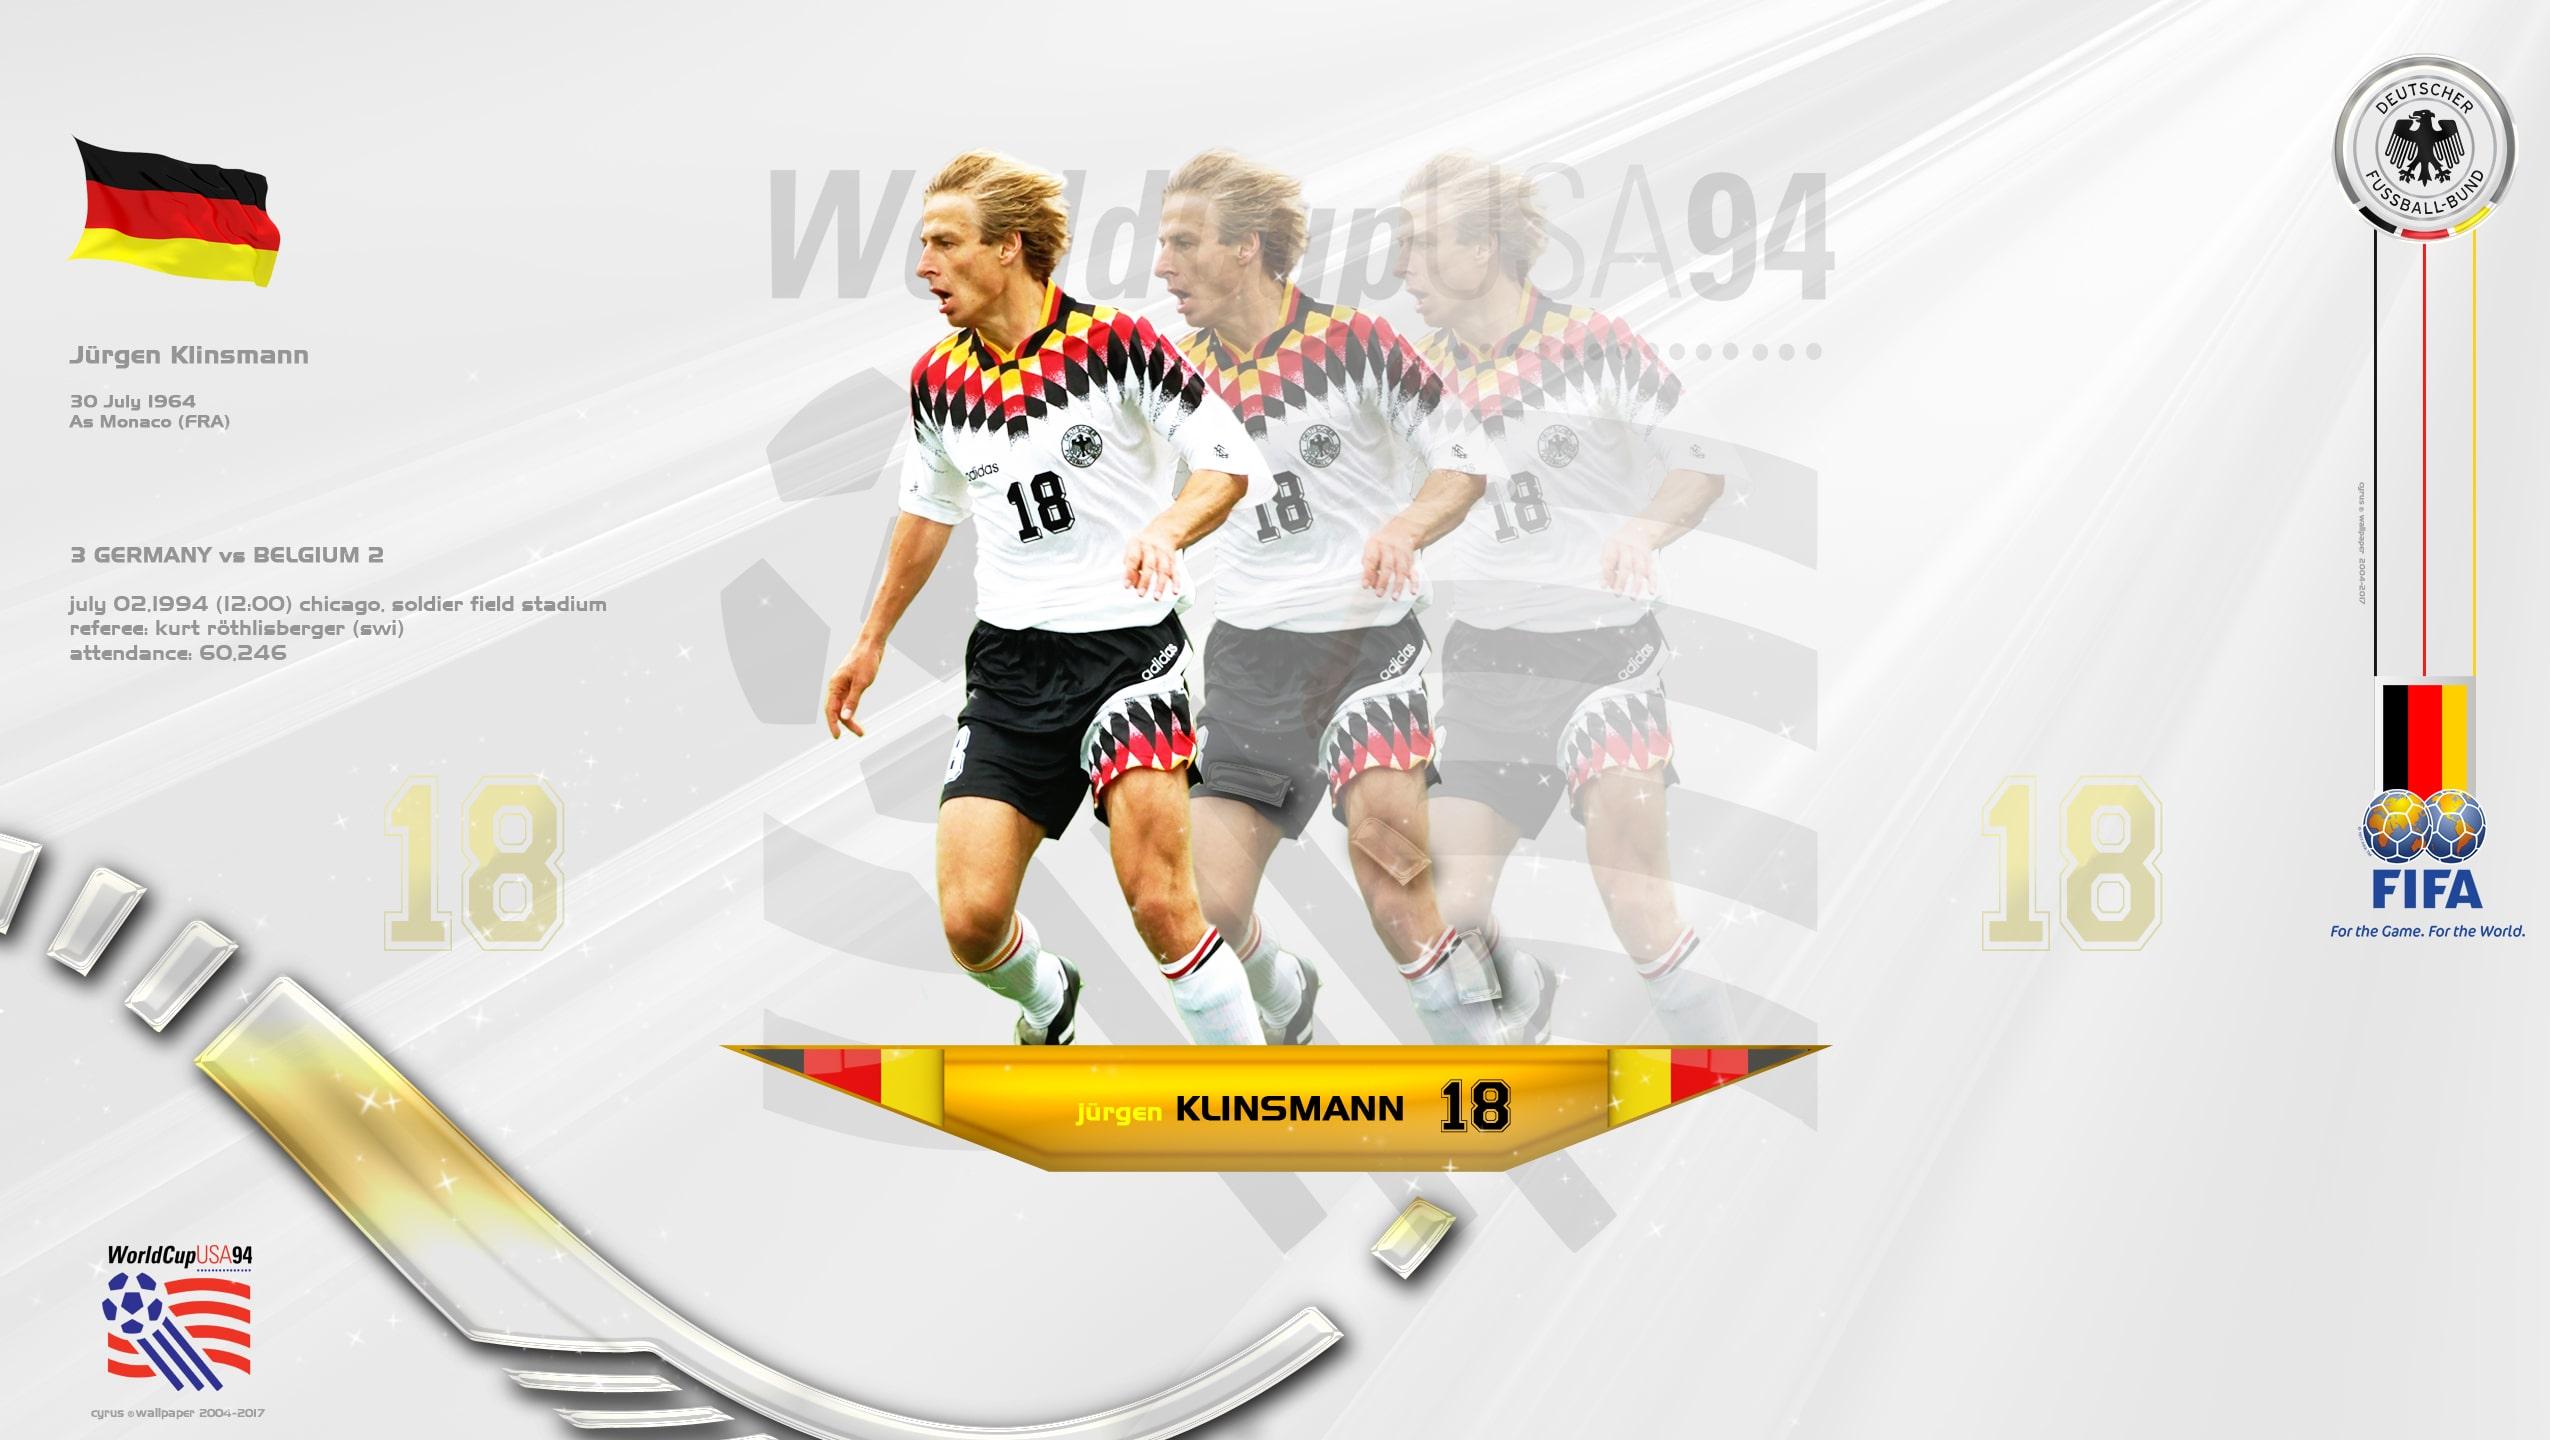 والپیپر یورگن کلینزمن مهاجم گلزن آلمان در جام جهانی 1994